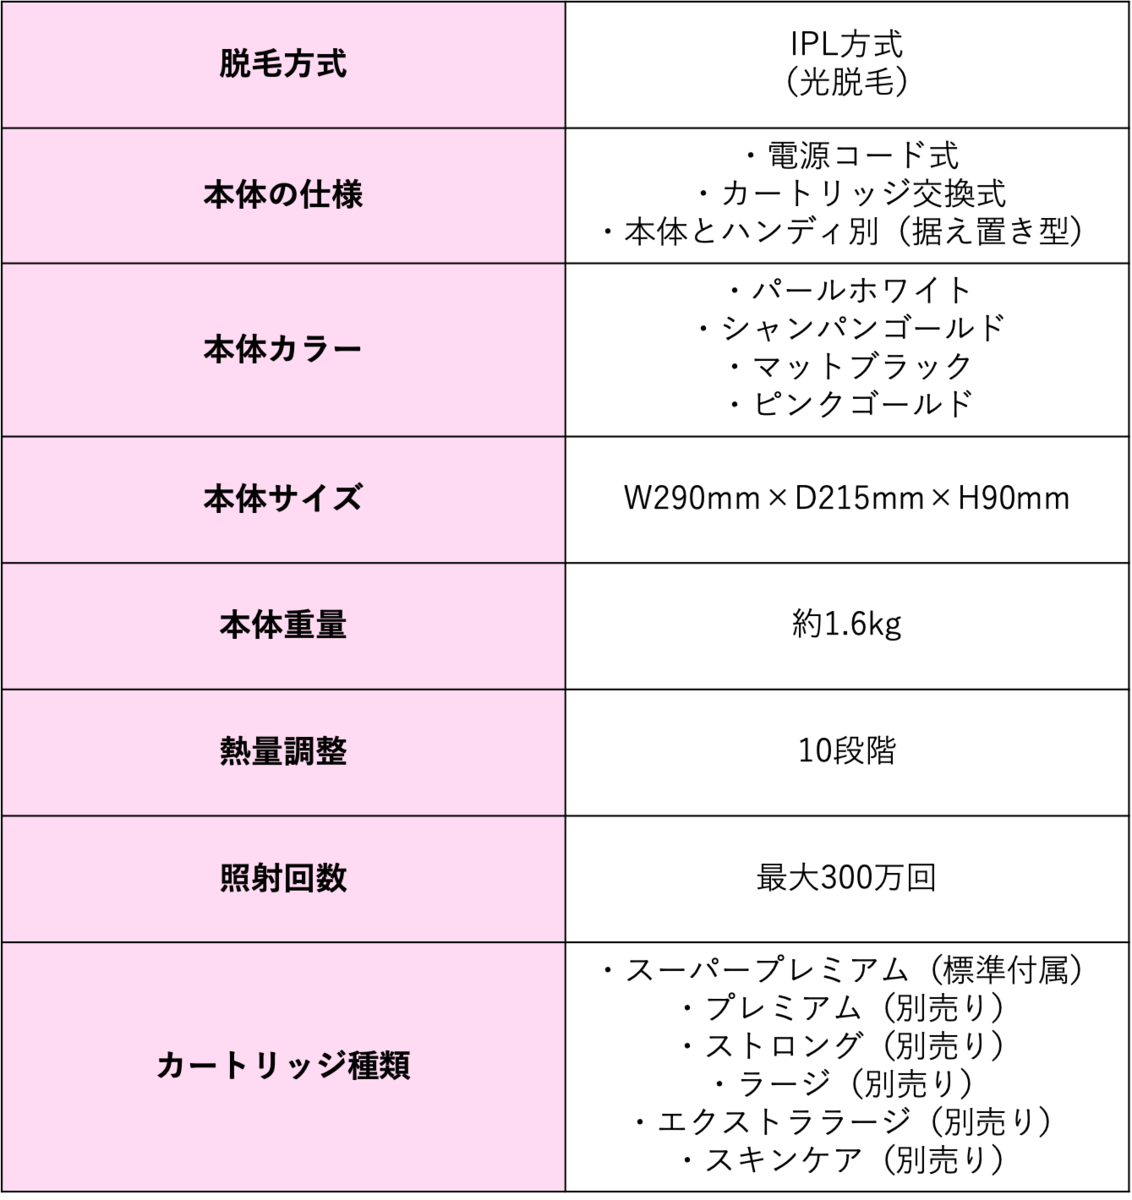 f:id:purinnchan:20210605151912p:plain